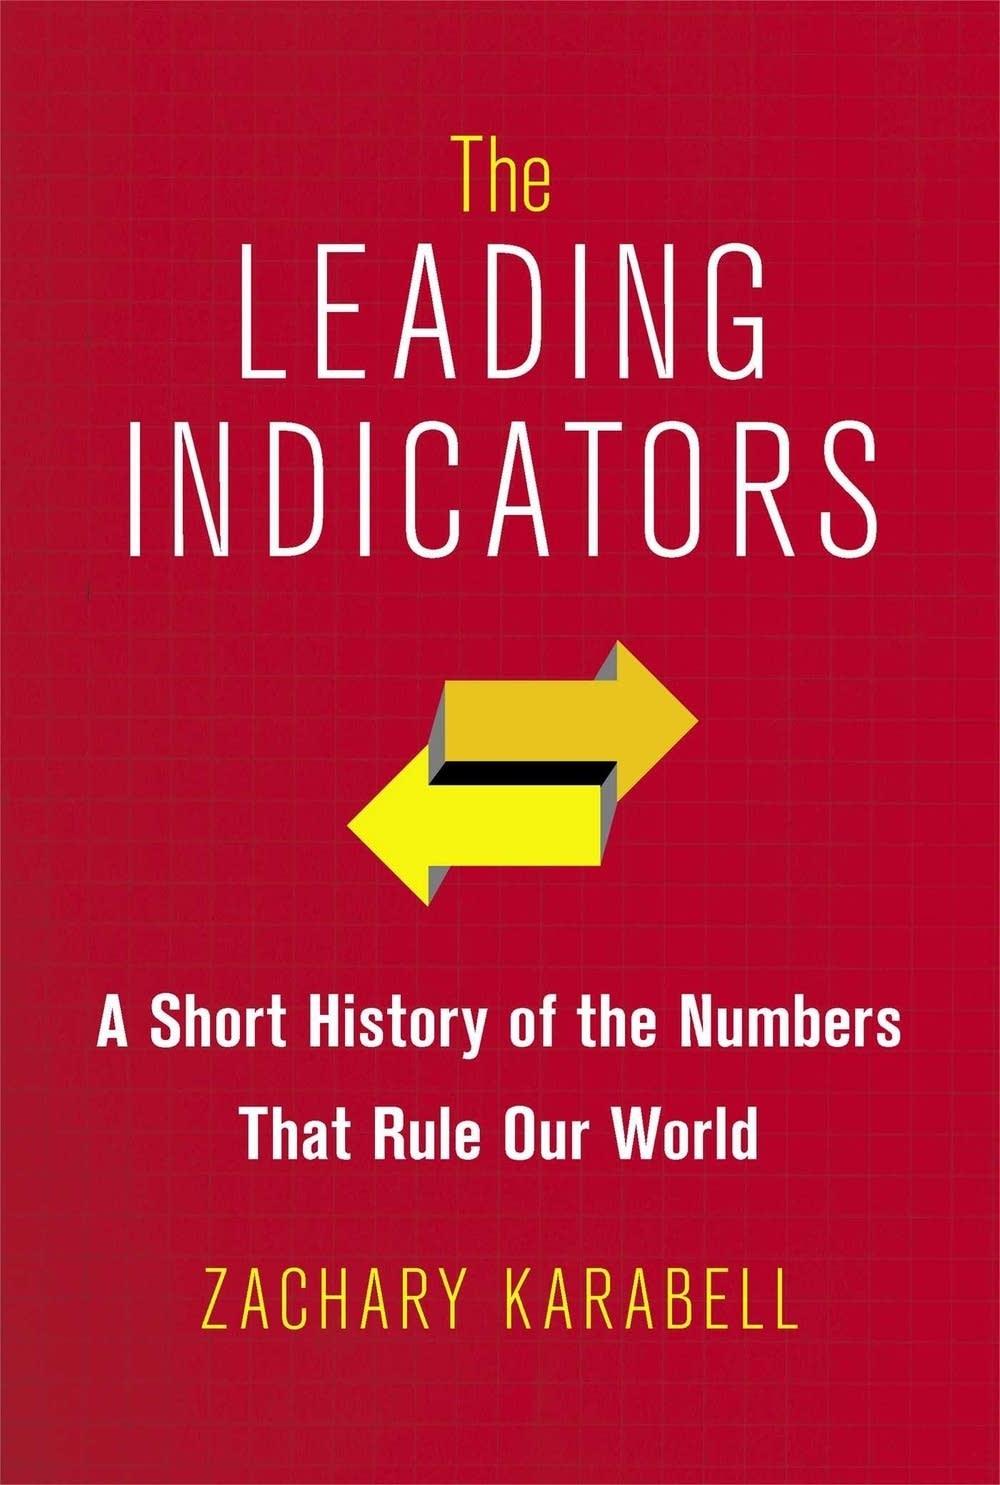 'The Leading Indicators'